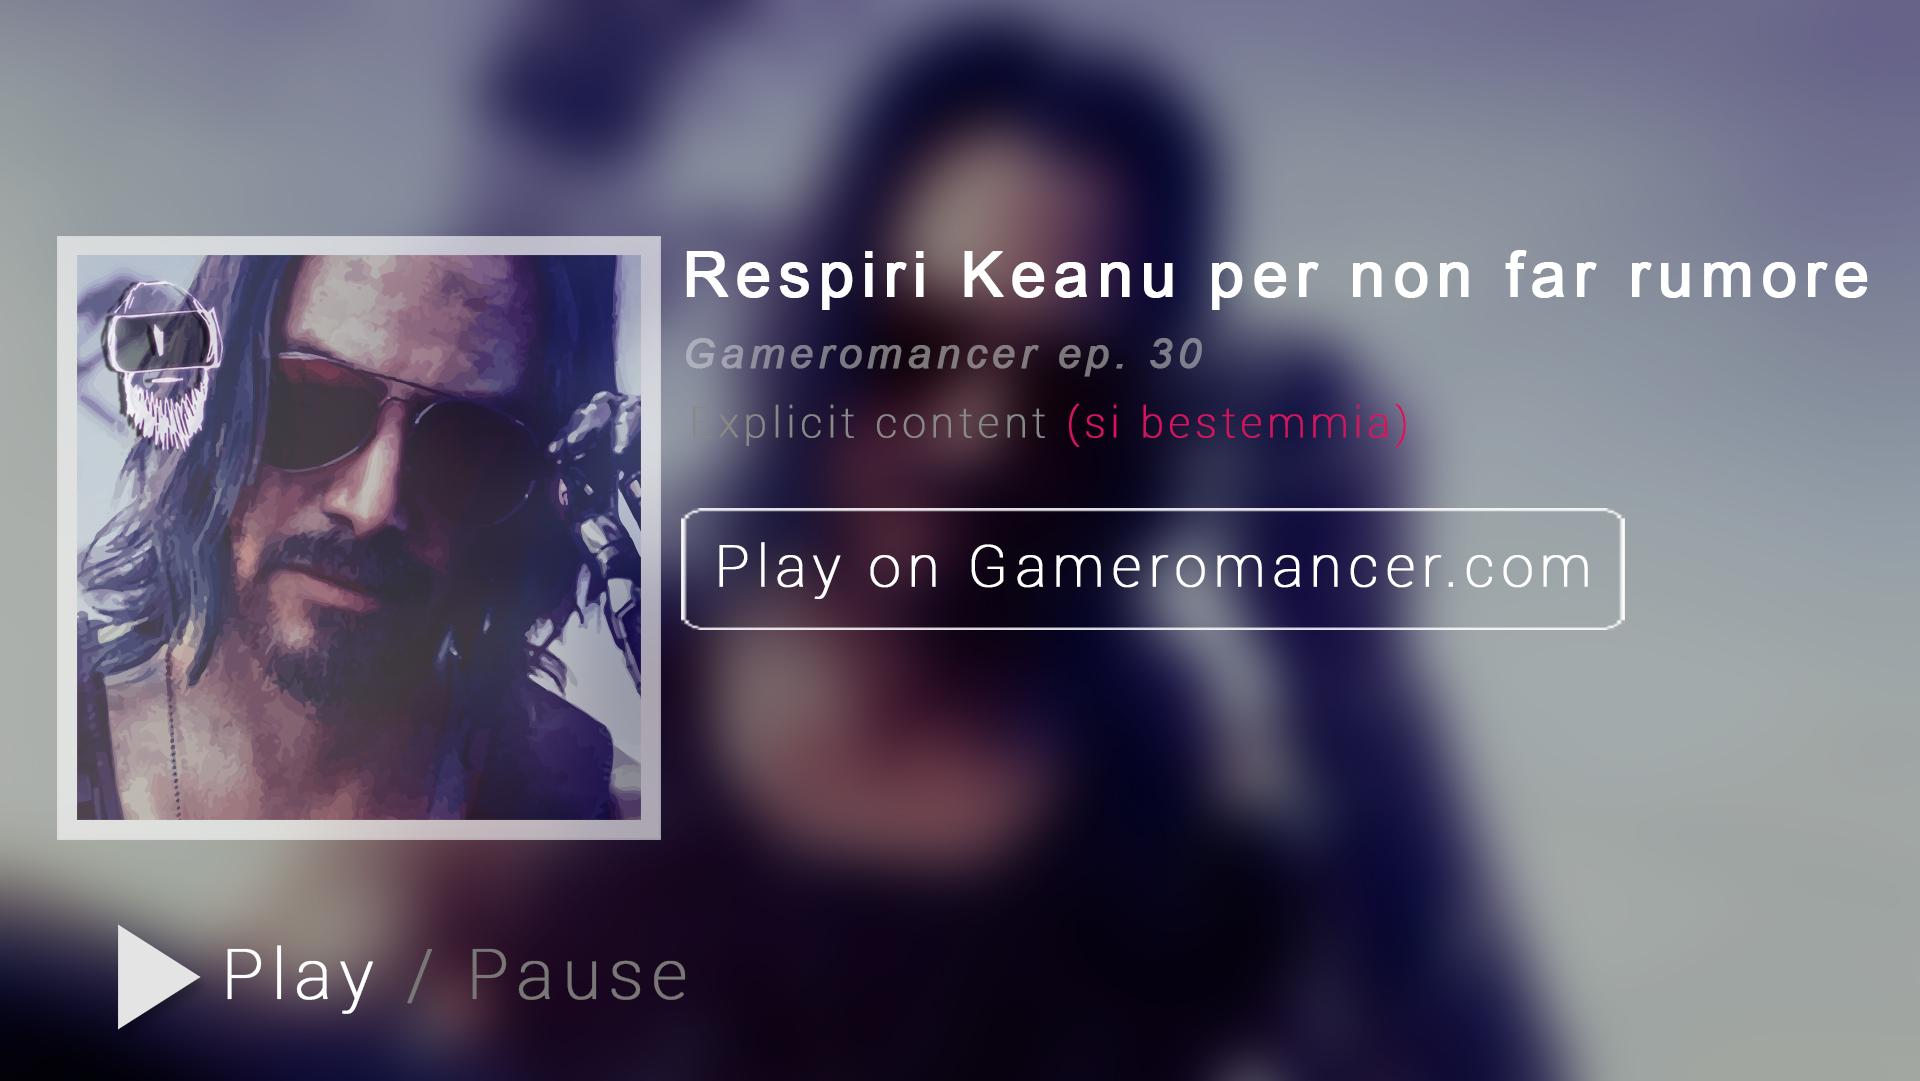 Ep. 30: Respiri Keanu per non far rumore